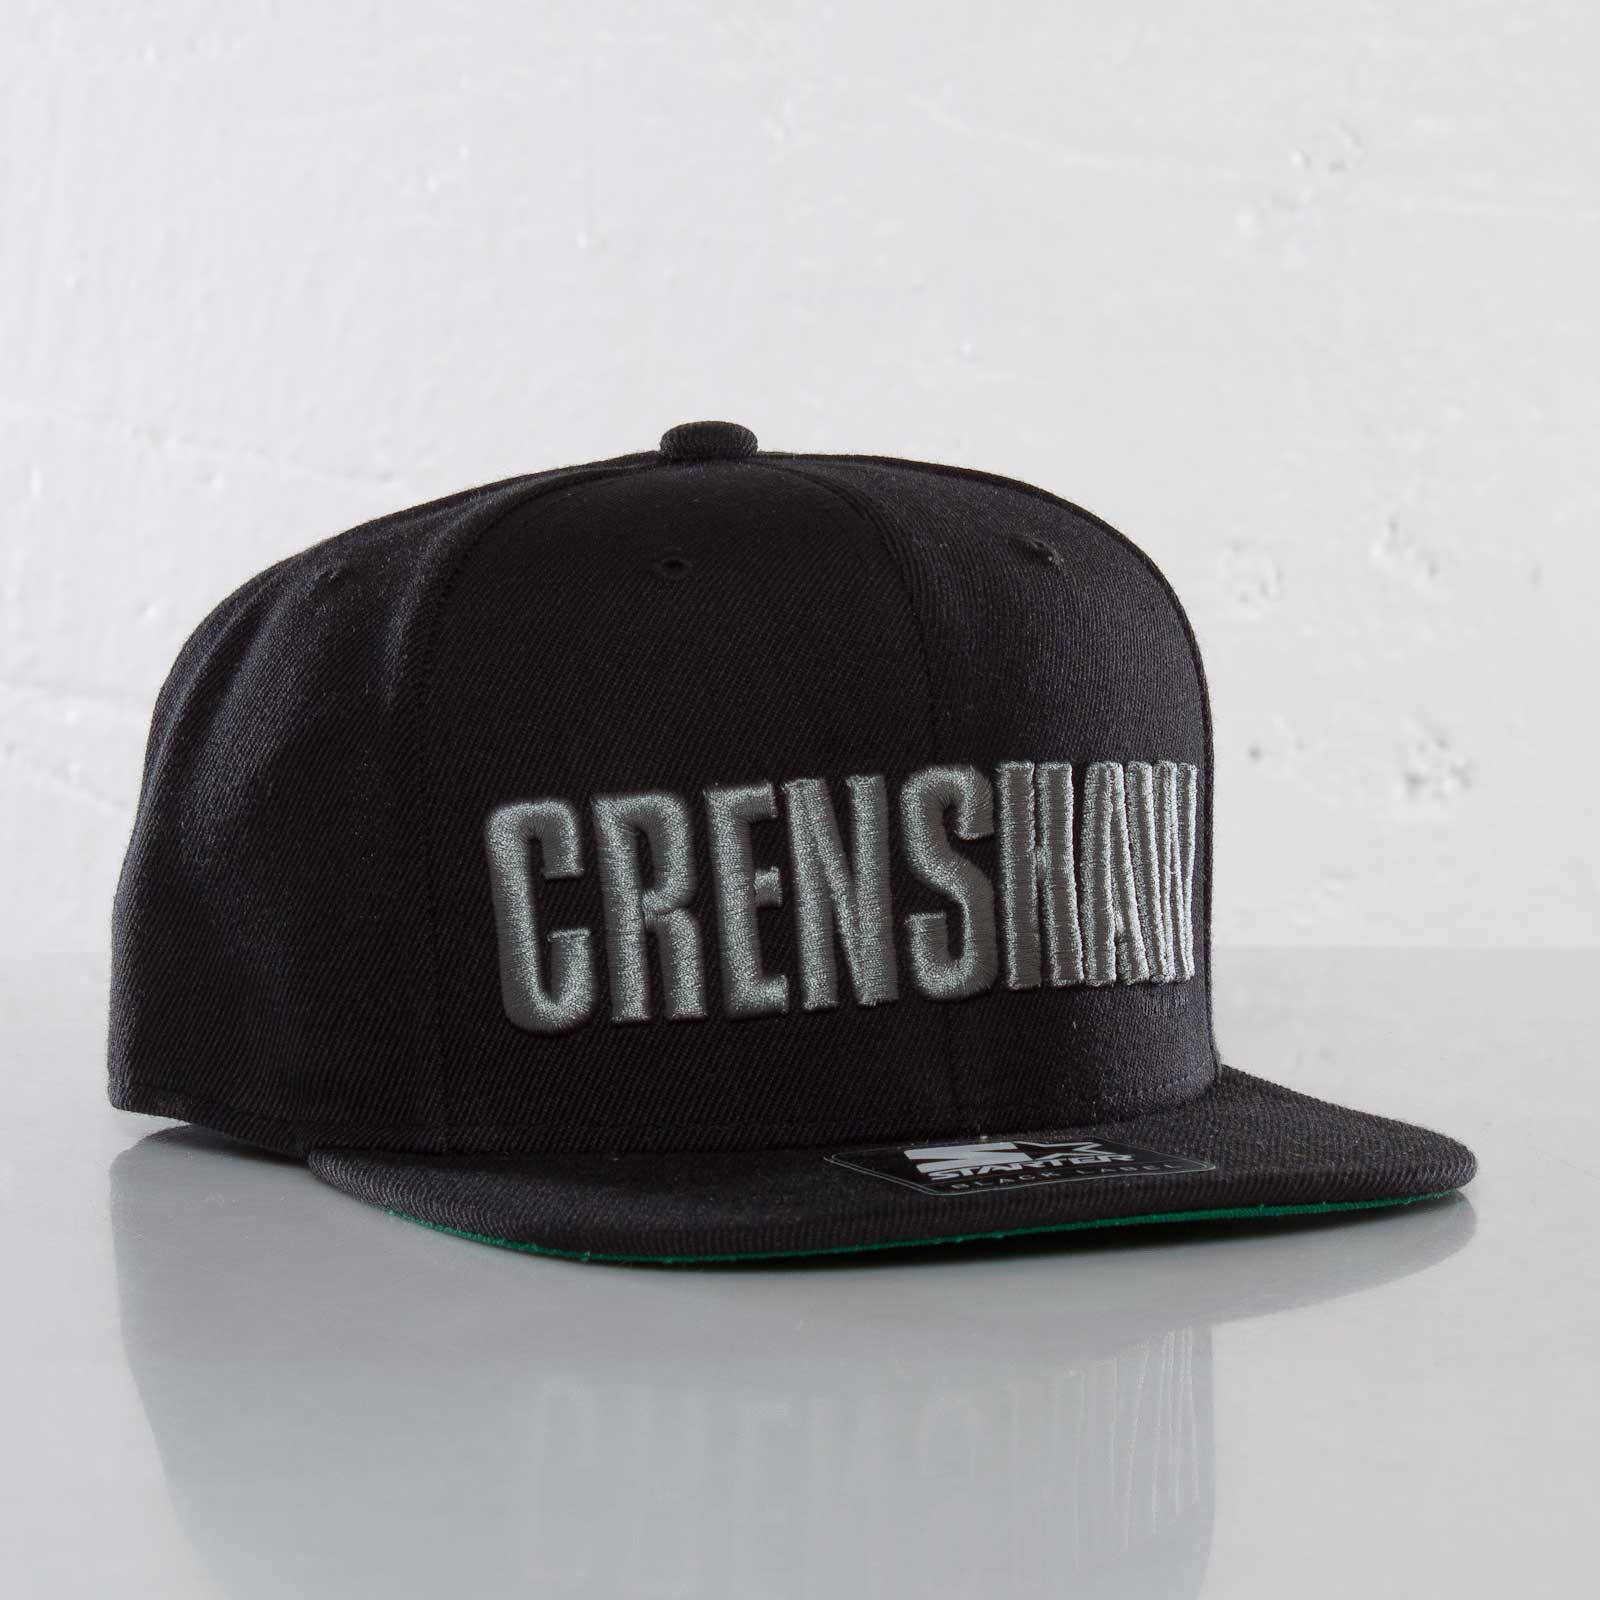 Starter Crenshaw Snapback - ST-CRENSHAWSB--BITH-BLK-OS ... 54e8823db56